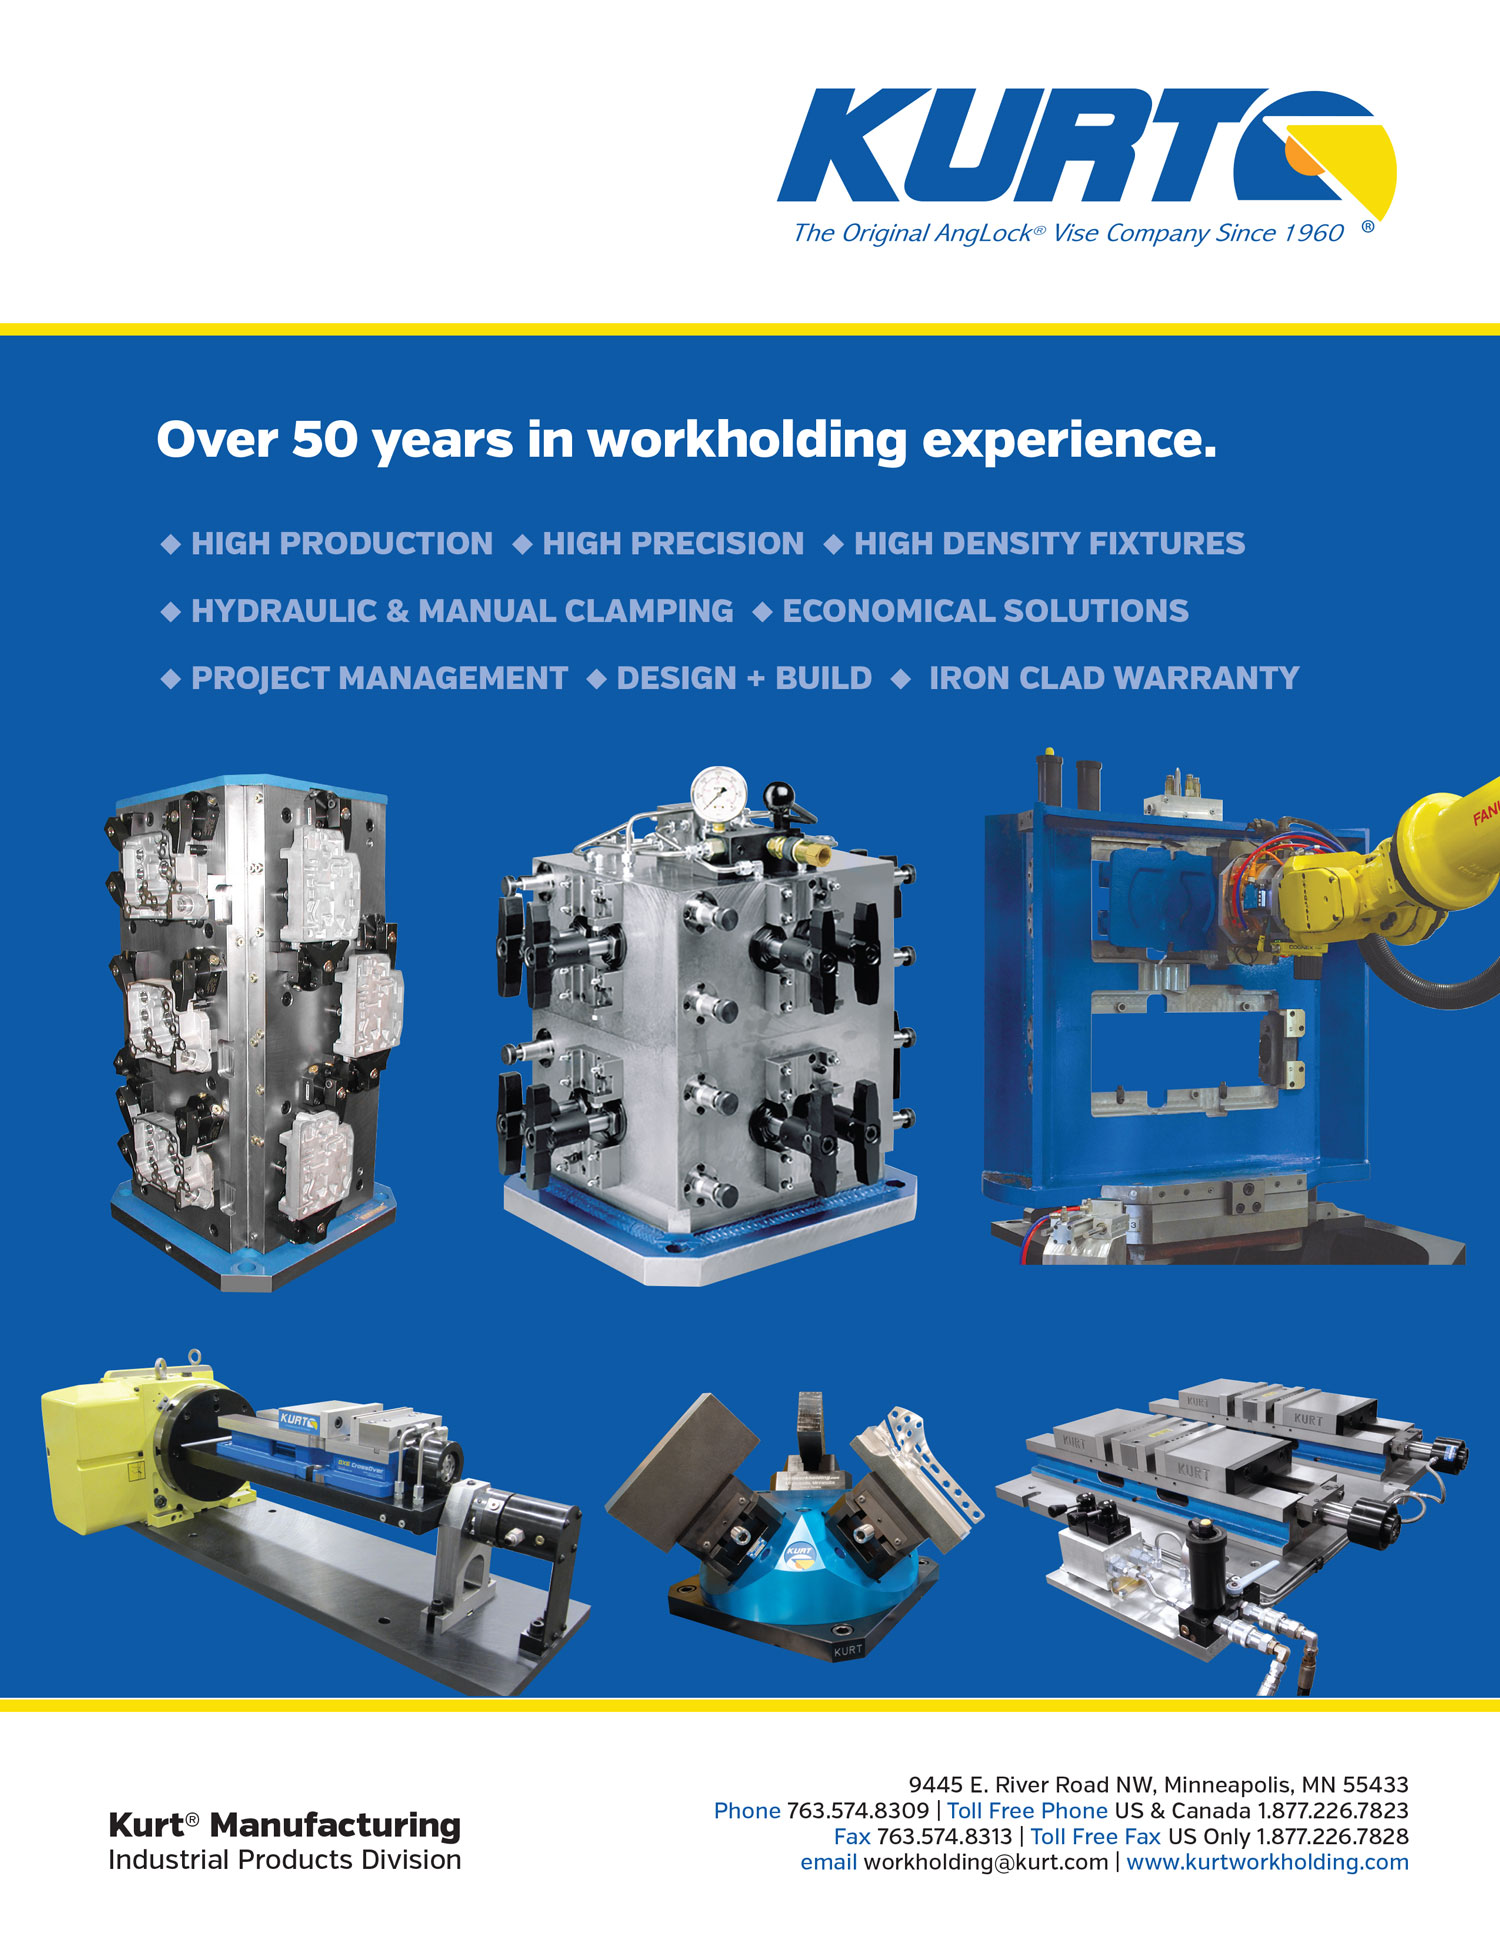 Kurt-Custom-Engineered-Workholding-Brochure.jpg